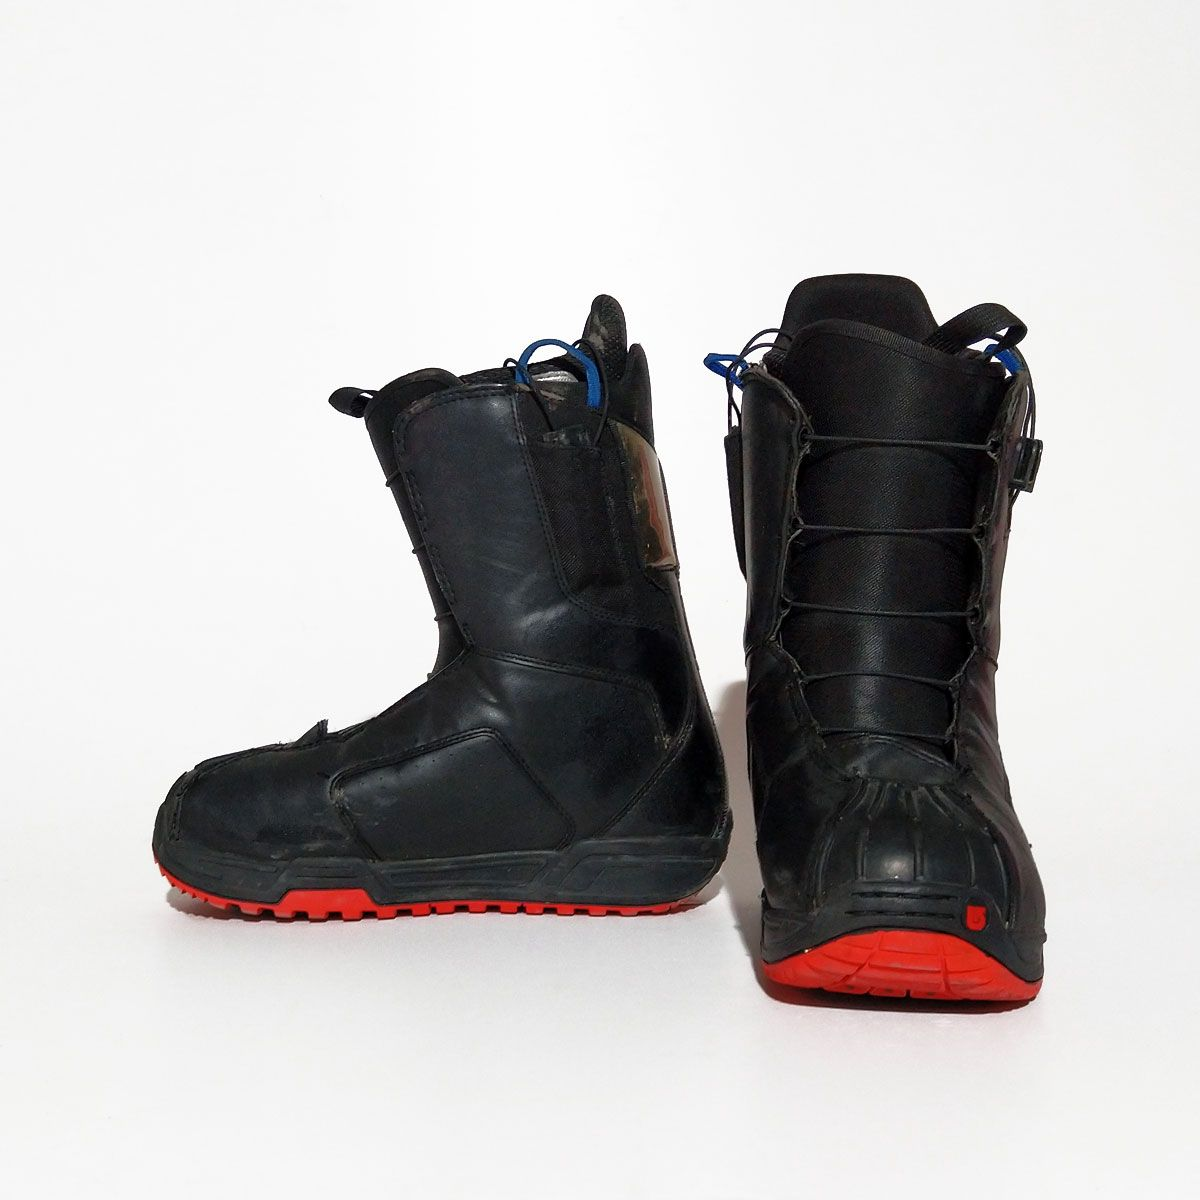 boots-snowboard-burton-progression-sz-2